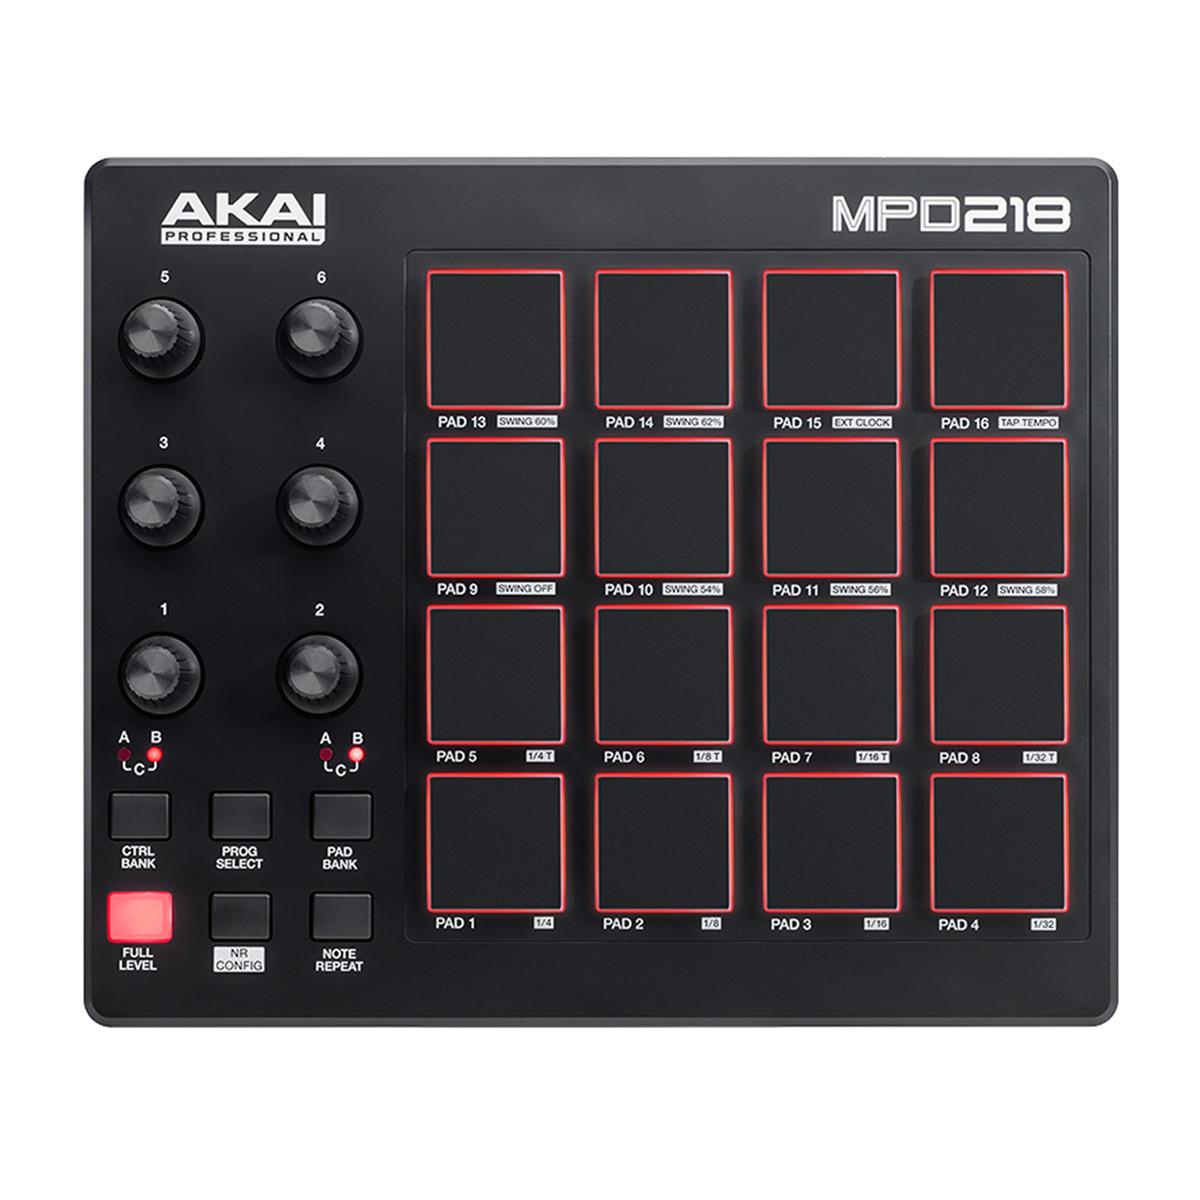 Image of Akai MPD218 Pad Controller